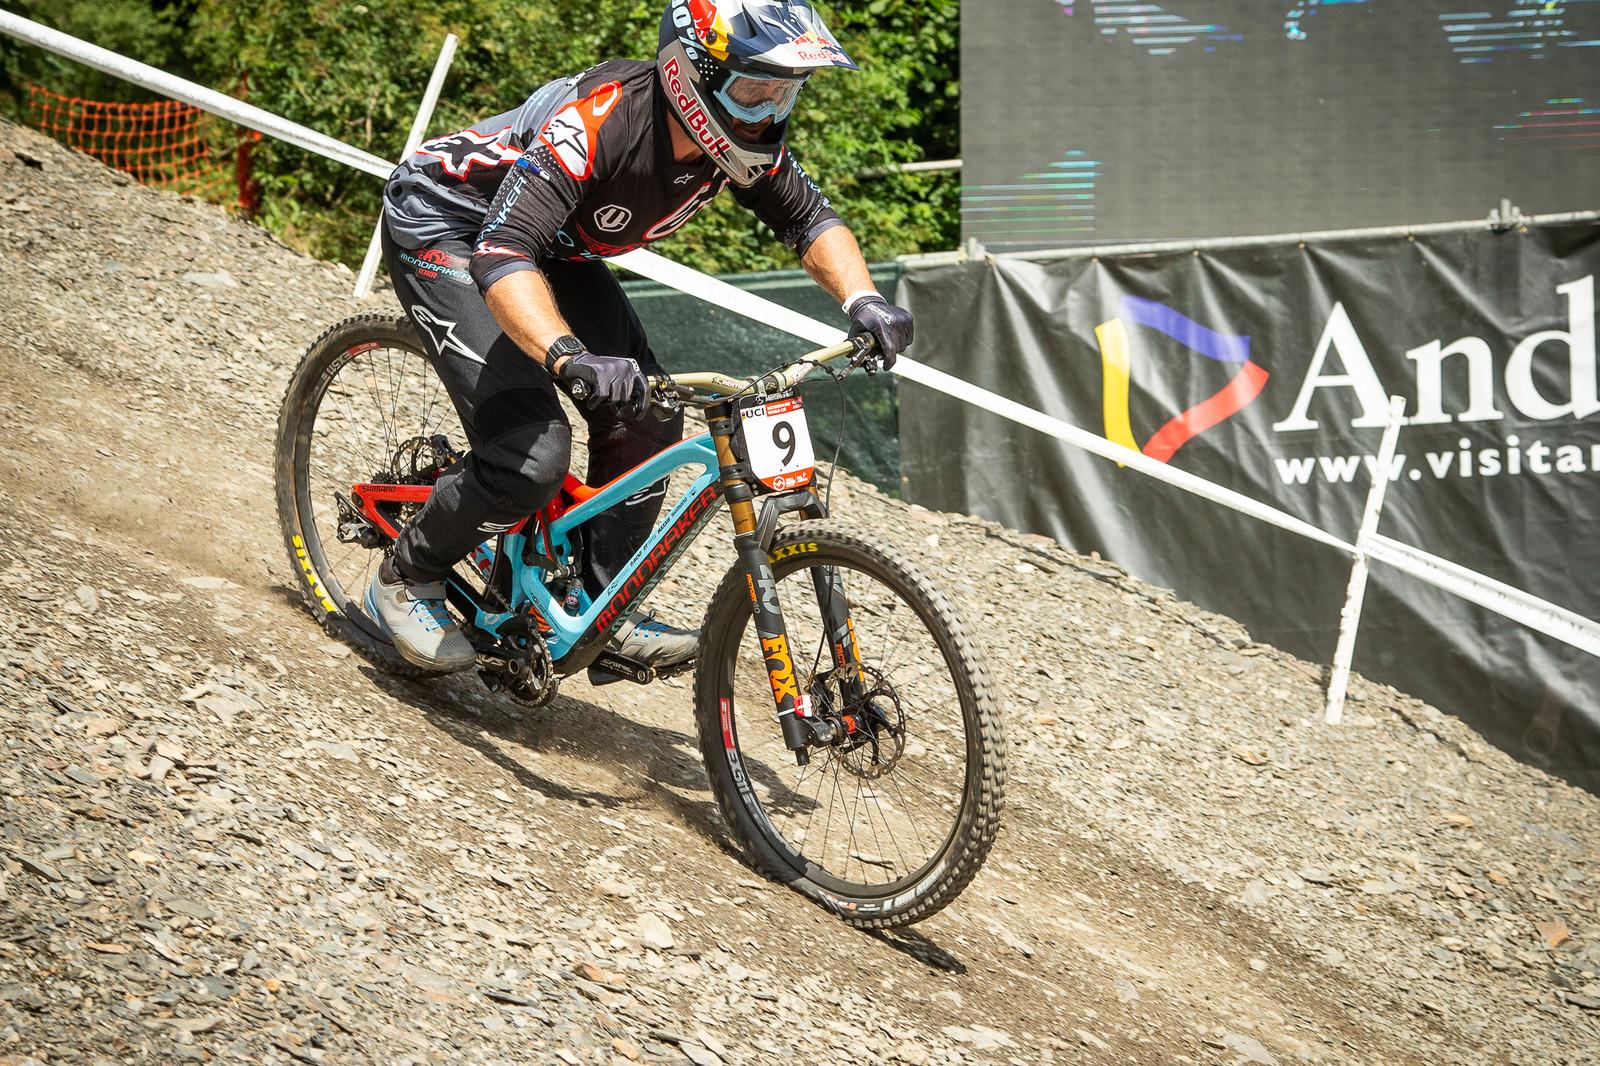 Brook MacDonald Mondraker Summum - G-Out Project - Andorra World Cup DH - Mountain Biking Pictures - Vital MTB